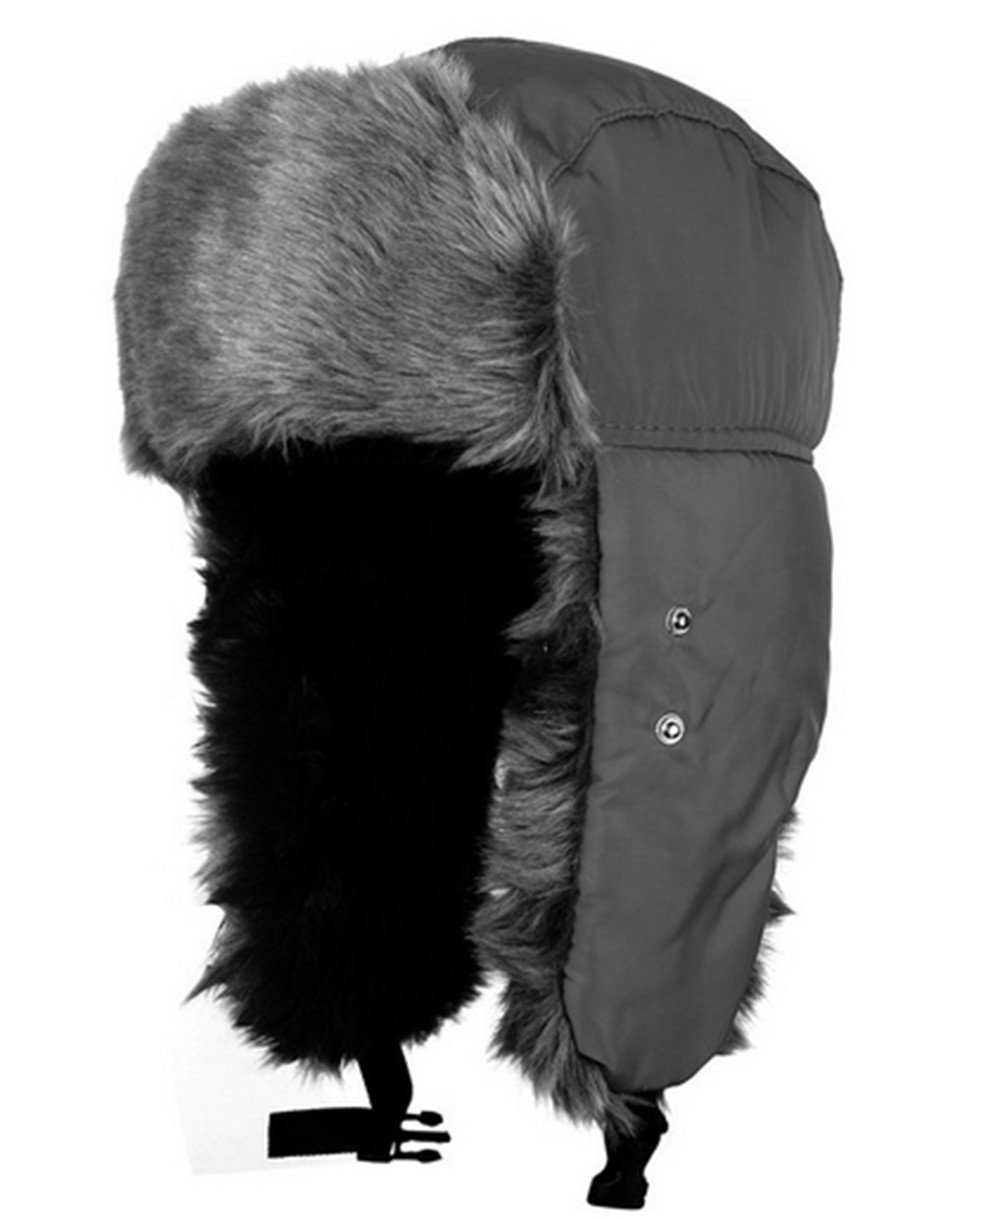 Oumosi Unisex Nylon Russian Style Winter Ear Flap Hat-DarkGrey